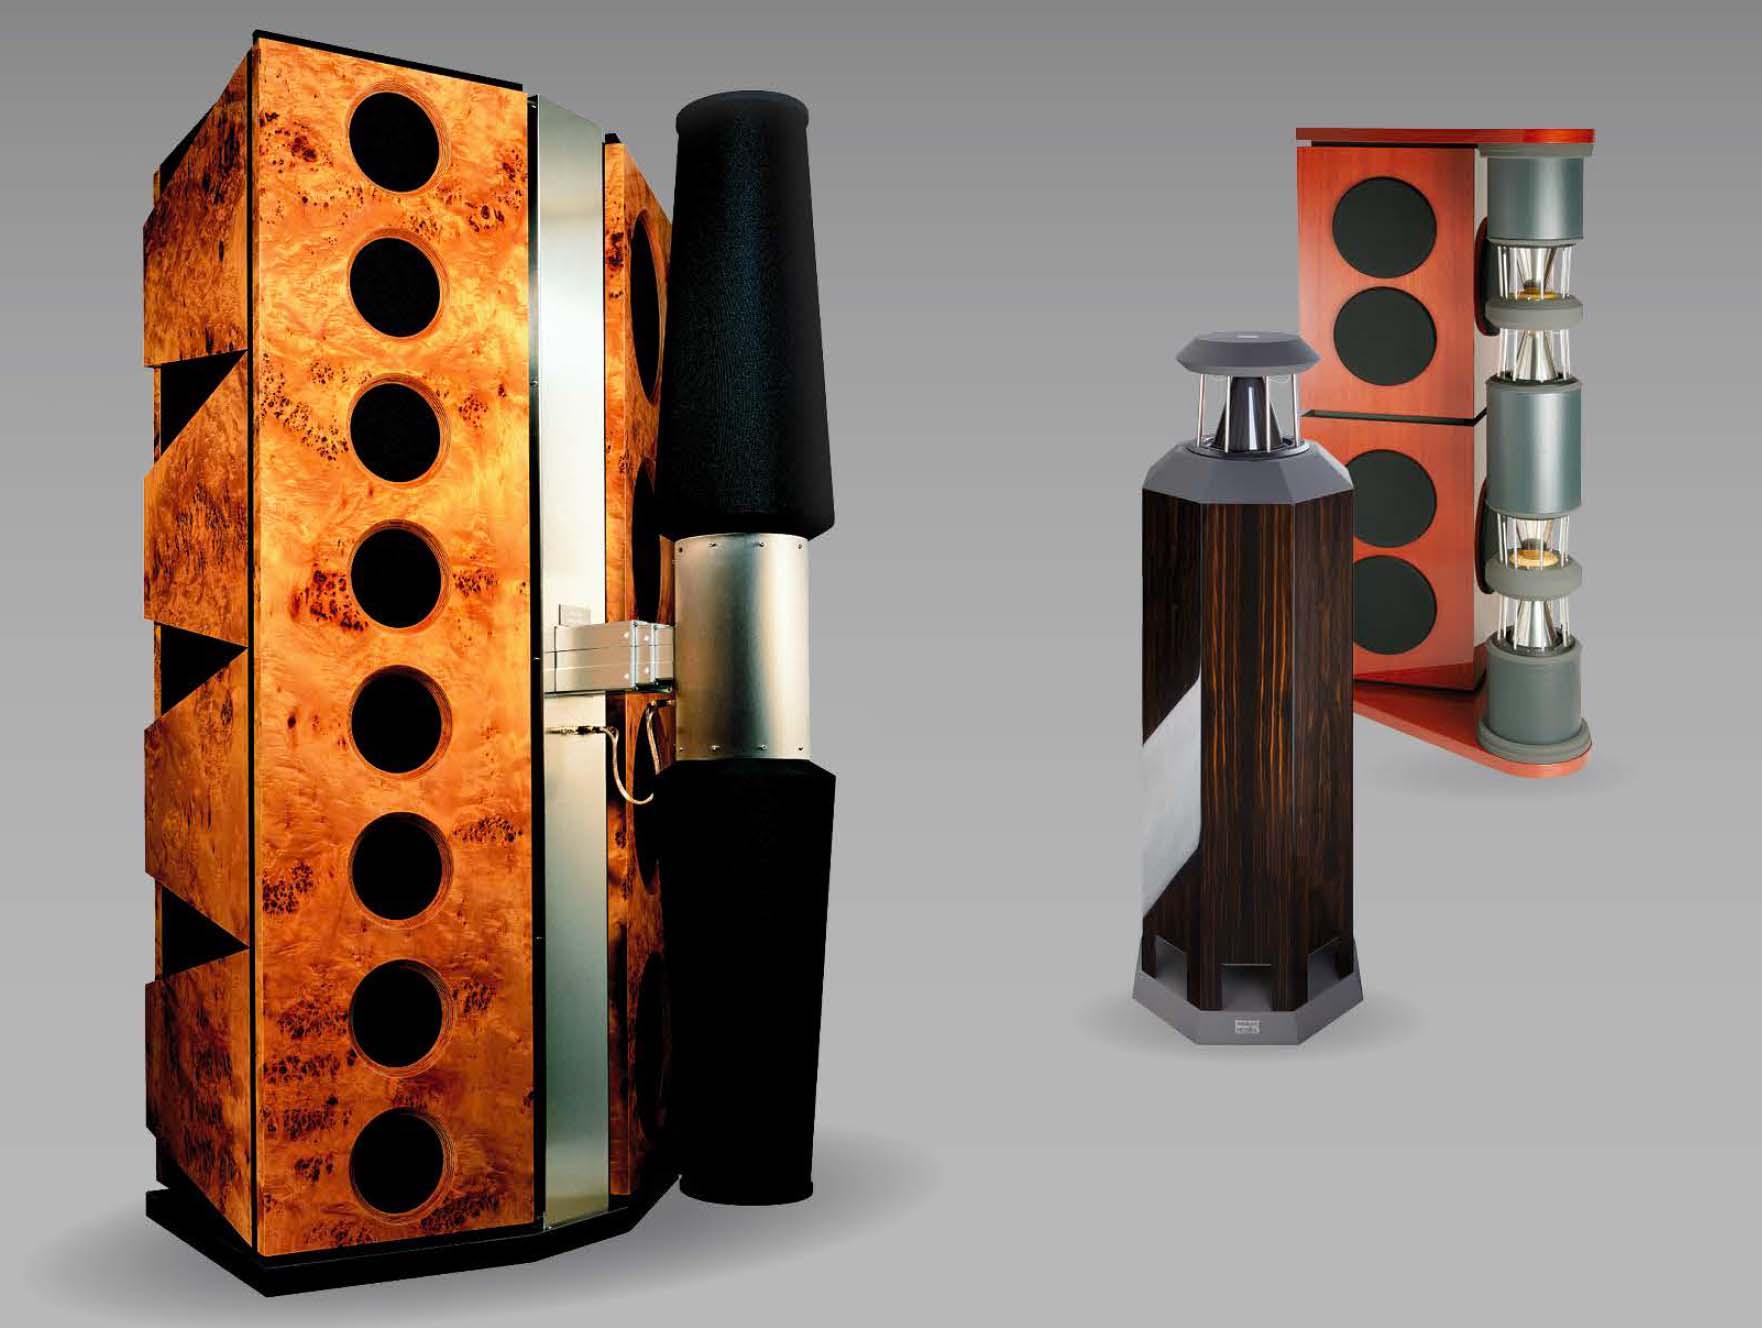 gaudi-pqs-402-speakers.jpg